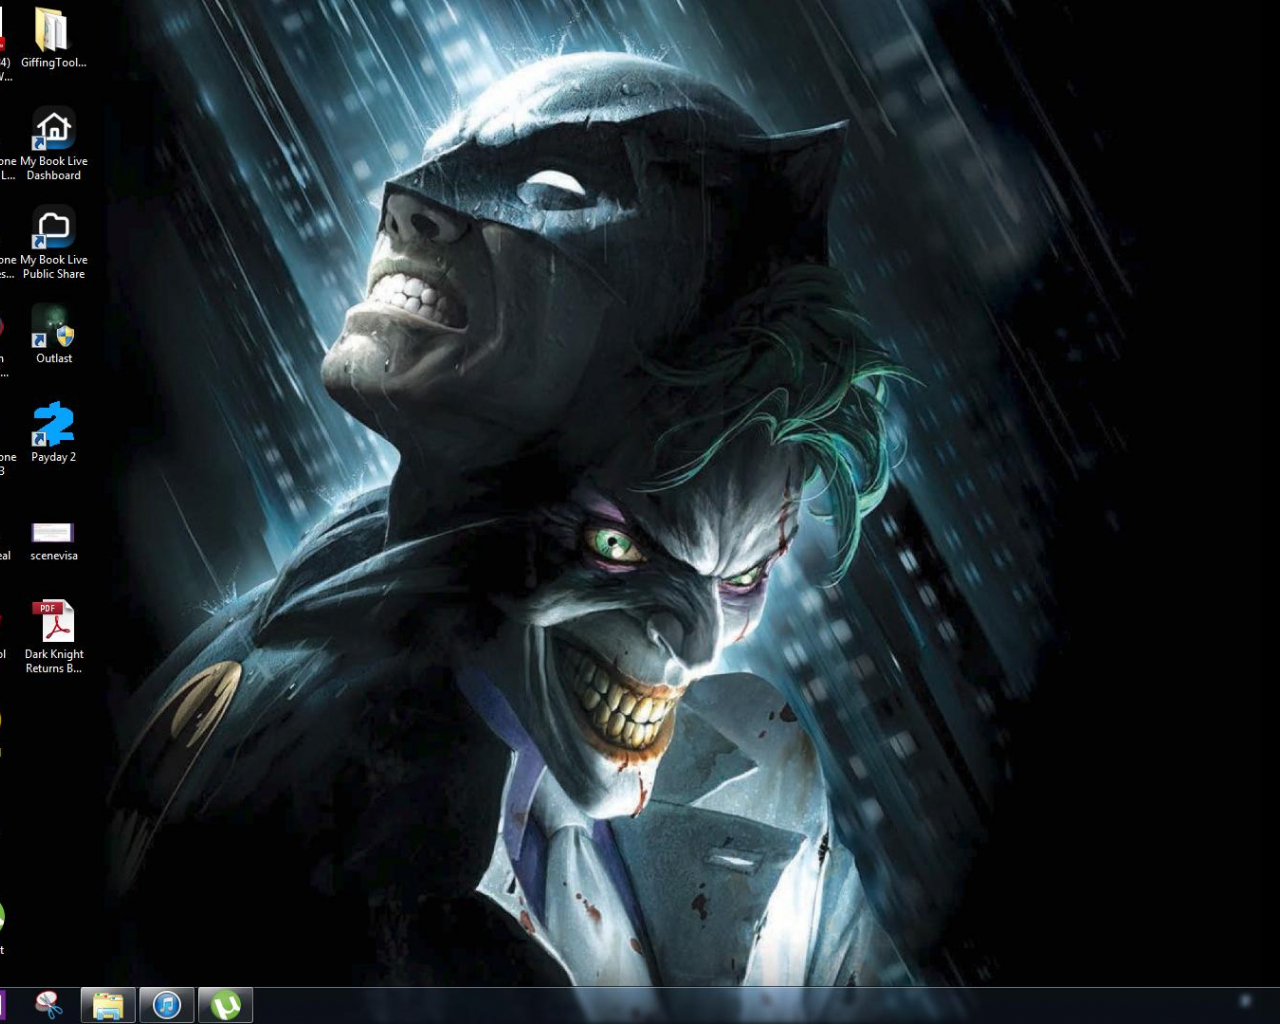 Free Download Pictures Batman Dark Knight The Joker Black Background Wallpapers 1920x1080 For Your Desktop Mobile Tablet Explore 49 Dark Knight Returns Wallpaper The Dark Knight Wallpaper Dark Knight